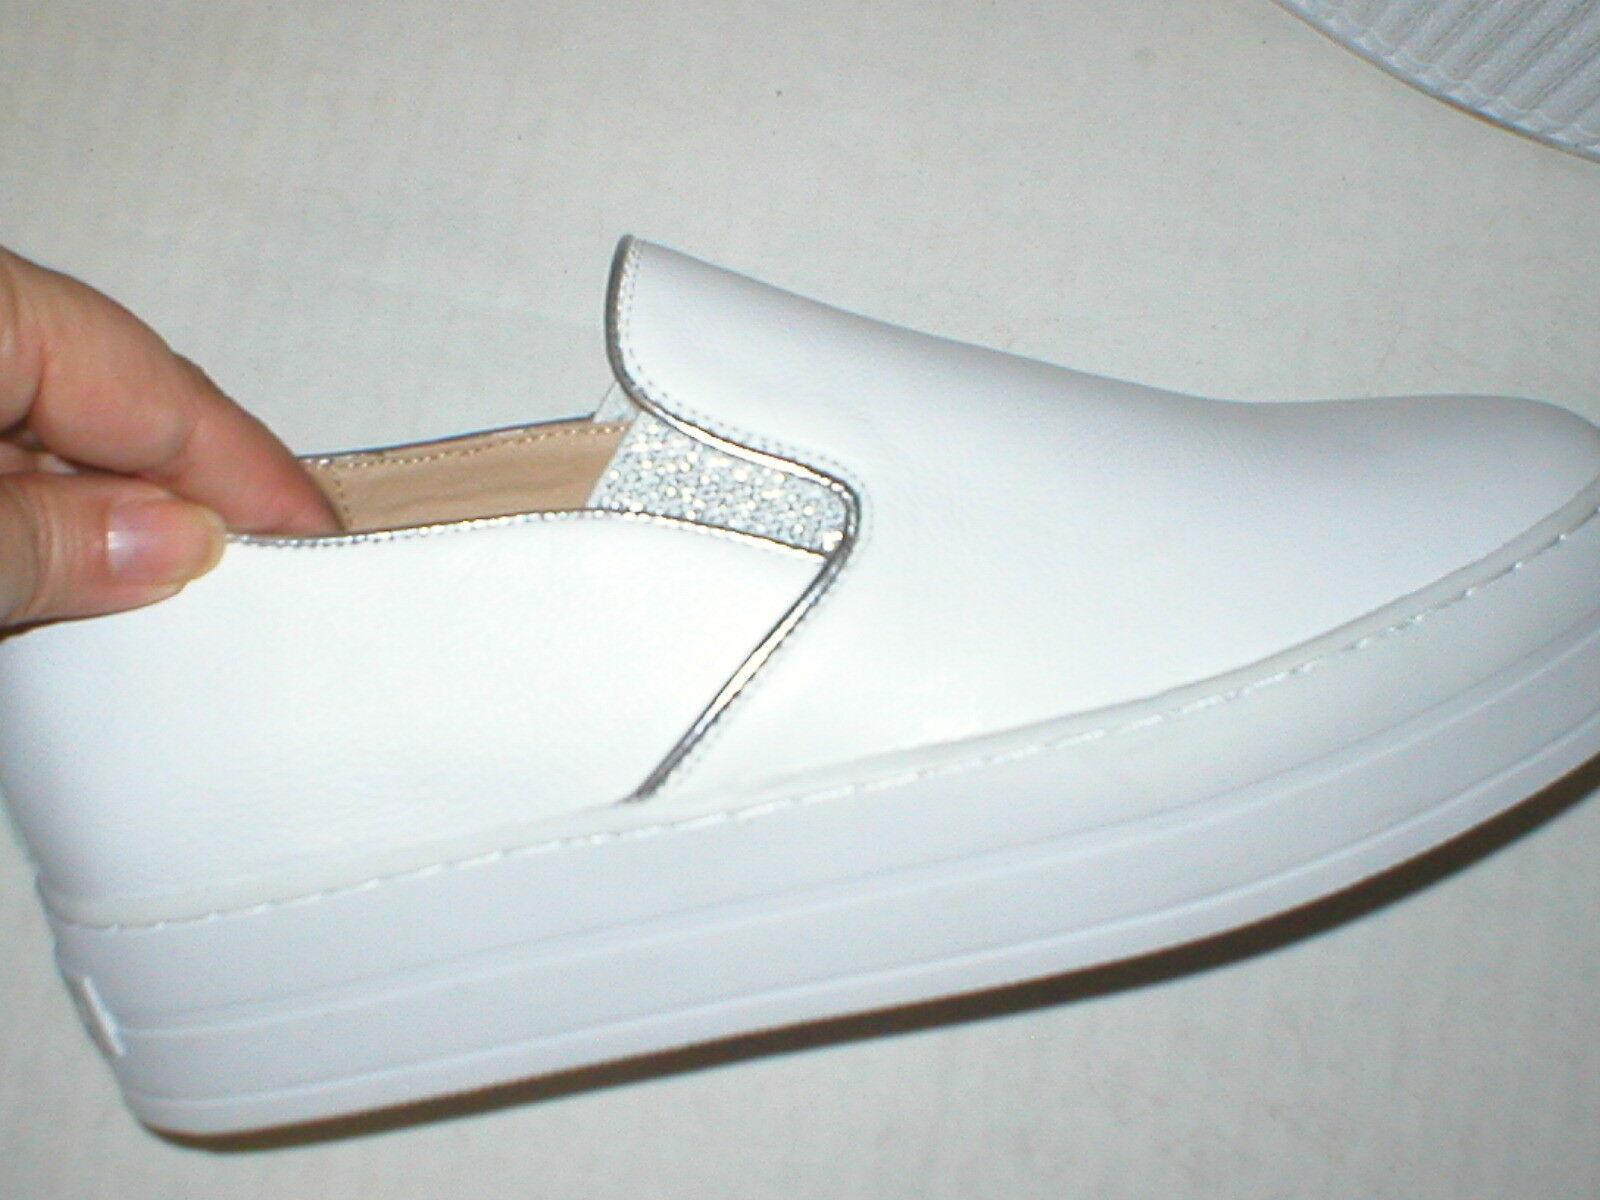 New  donna scarpe Fashion Casual scarpe da ginnastica 11 bianca Skchers Street Uplift Studs  vendita online